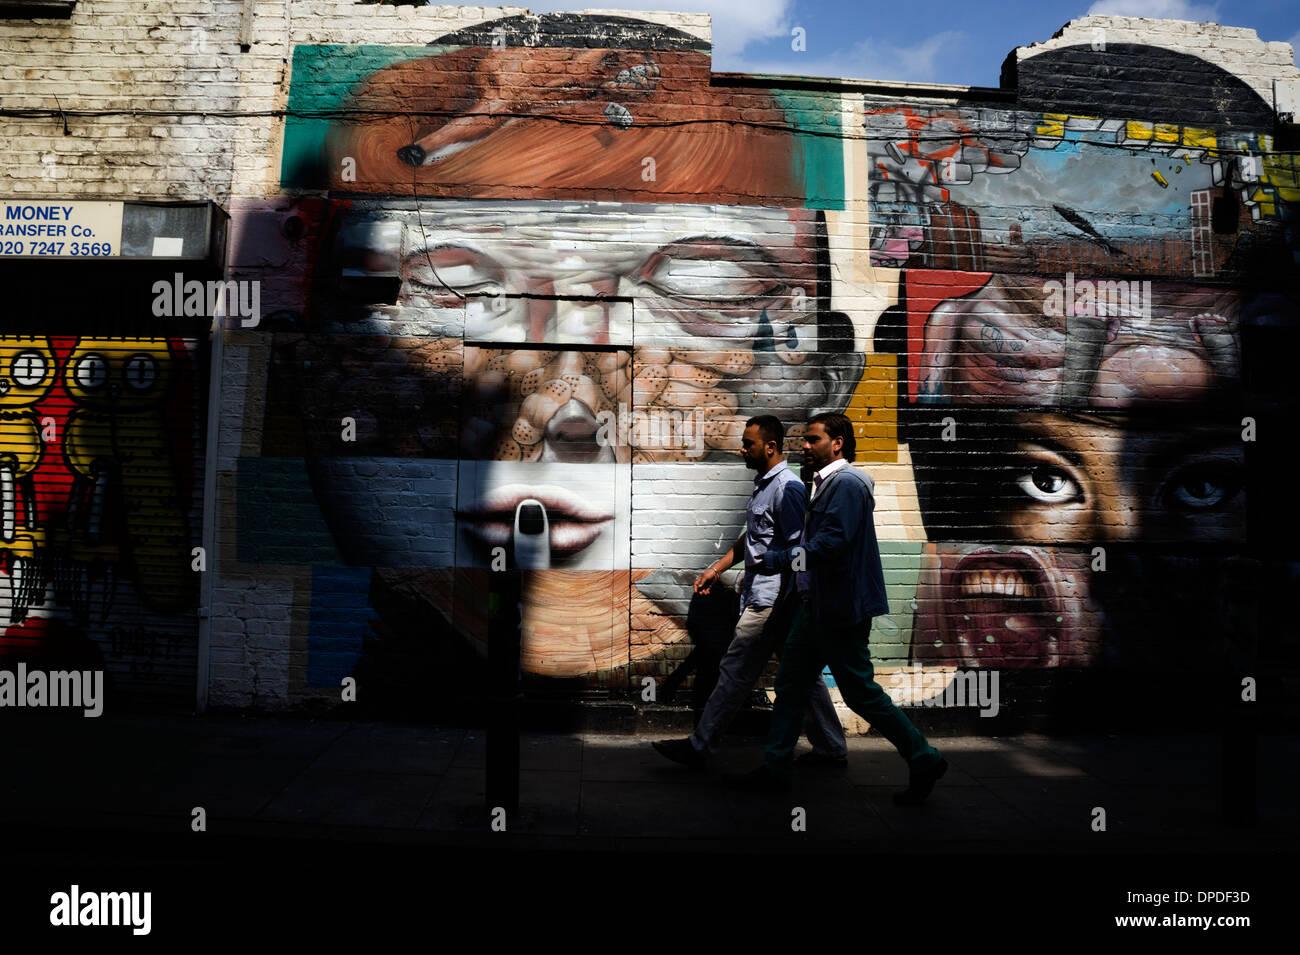 Two young Asian men walking past urban spray can graffiti street art Brick Lane area, East London E1 UK Stock Photo